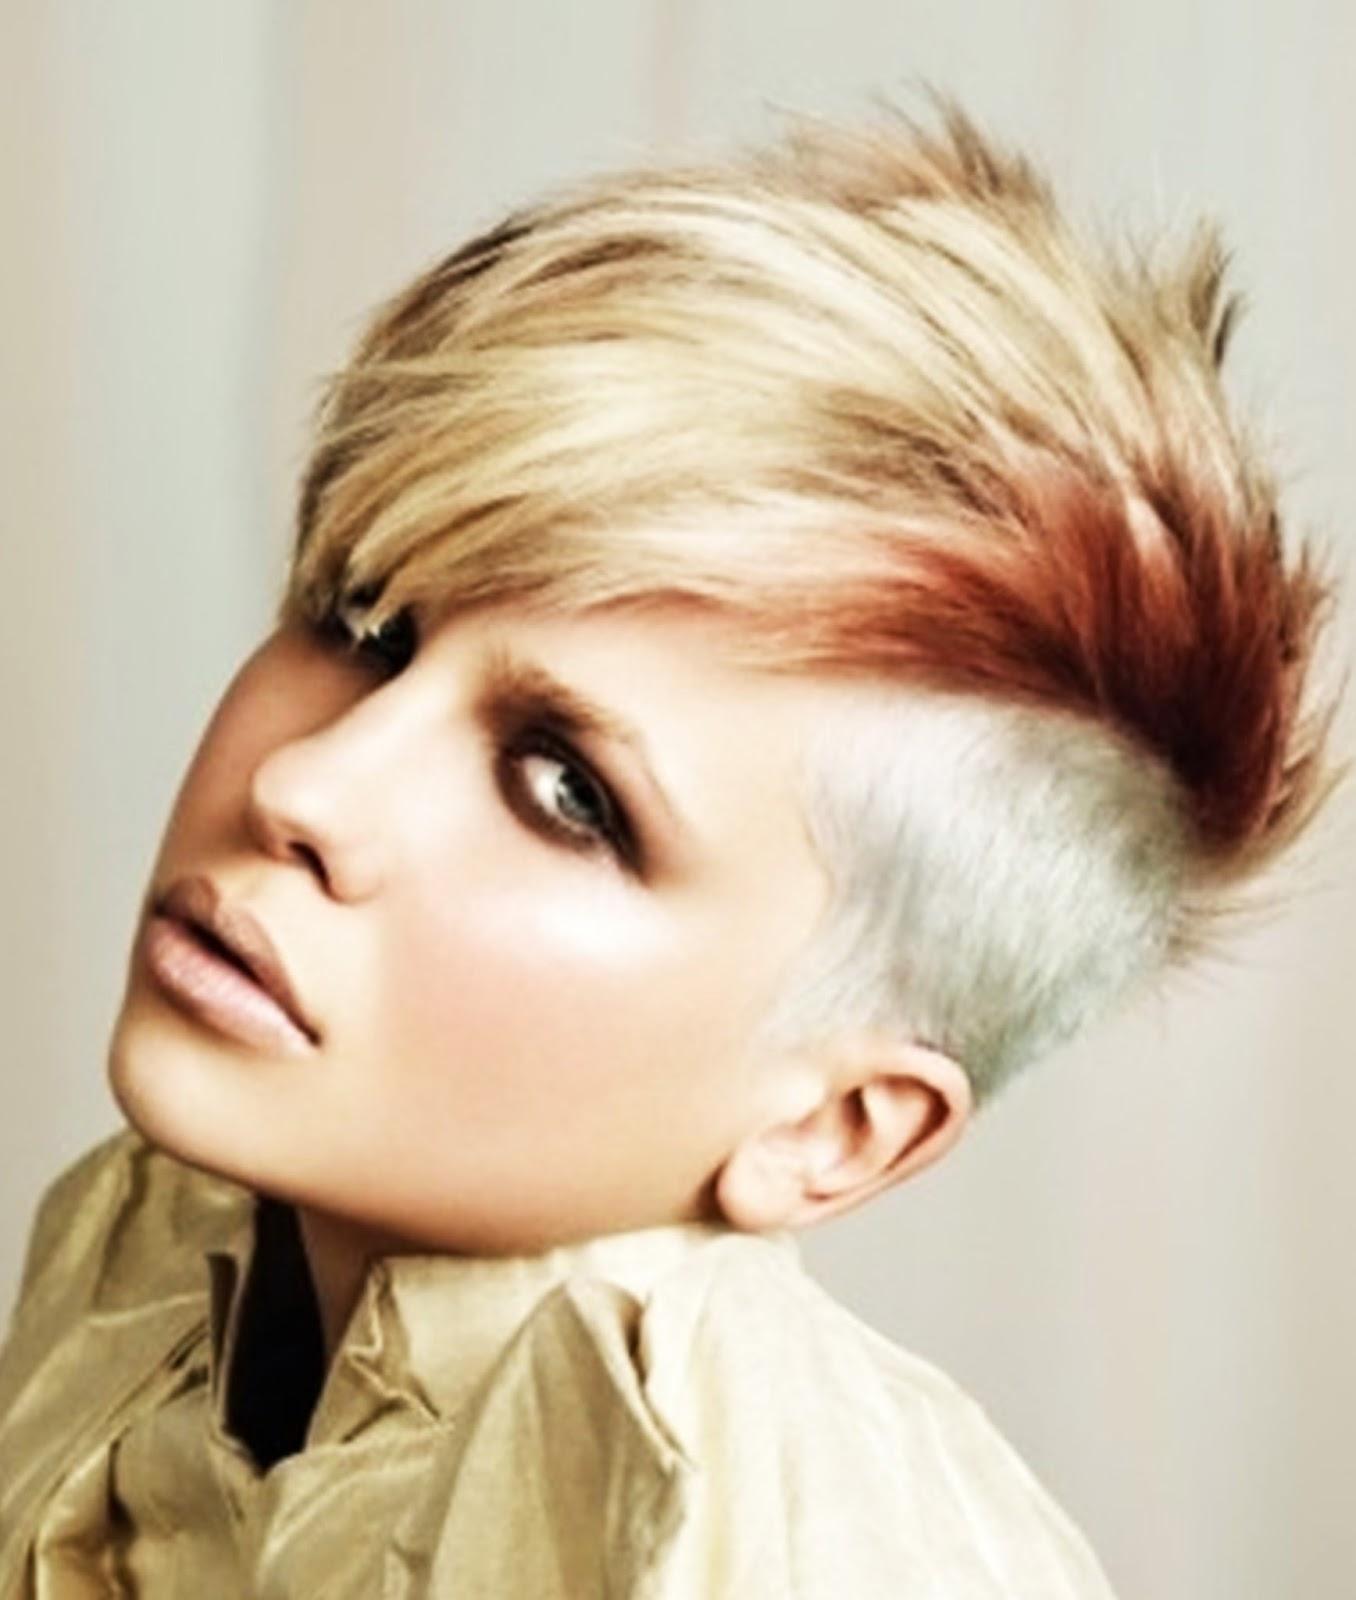 Mohawk Hairstyles For Women: Modern Look! | Hairstyles Spot